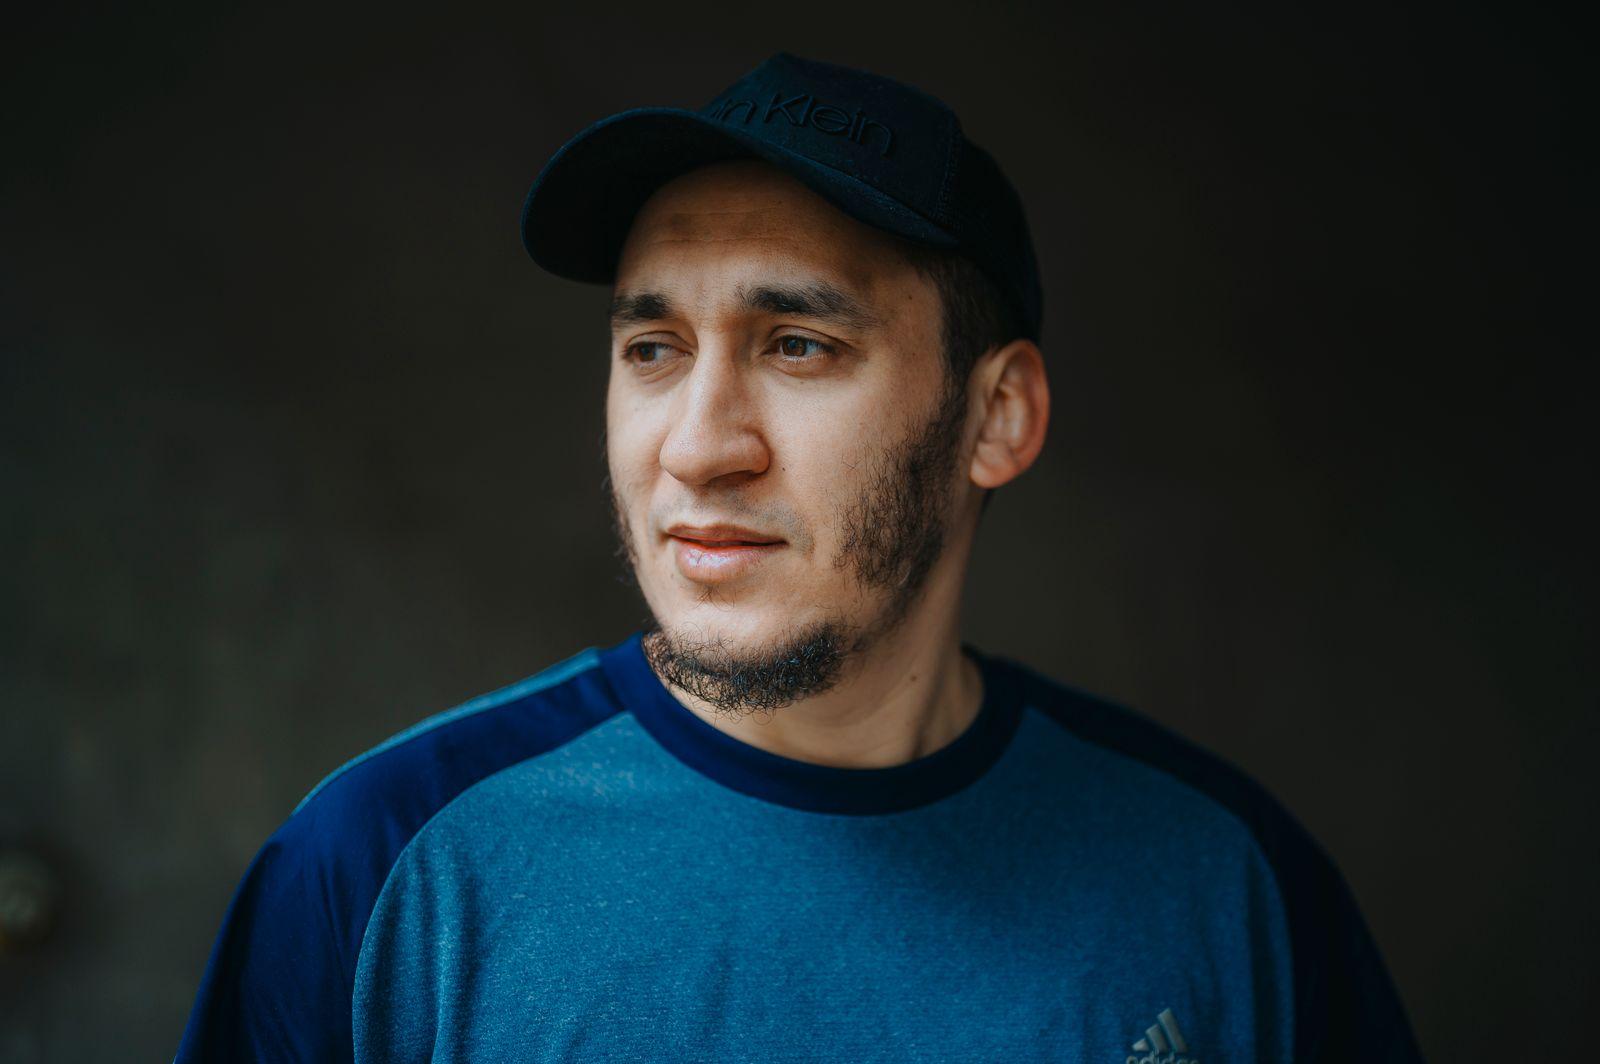 Mohammed_Hajib-MSimaitis-15